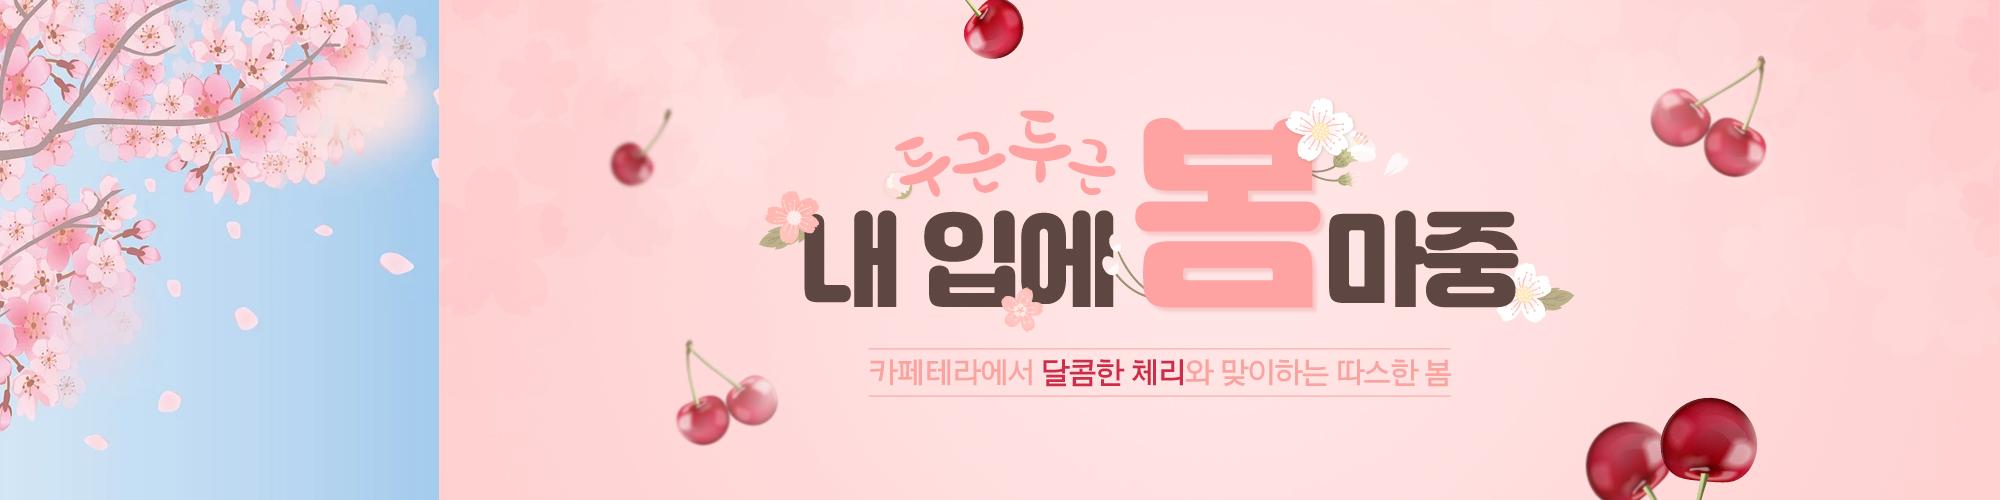 CherryBlossom_2000